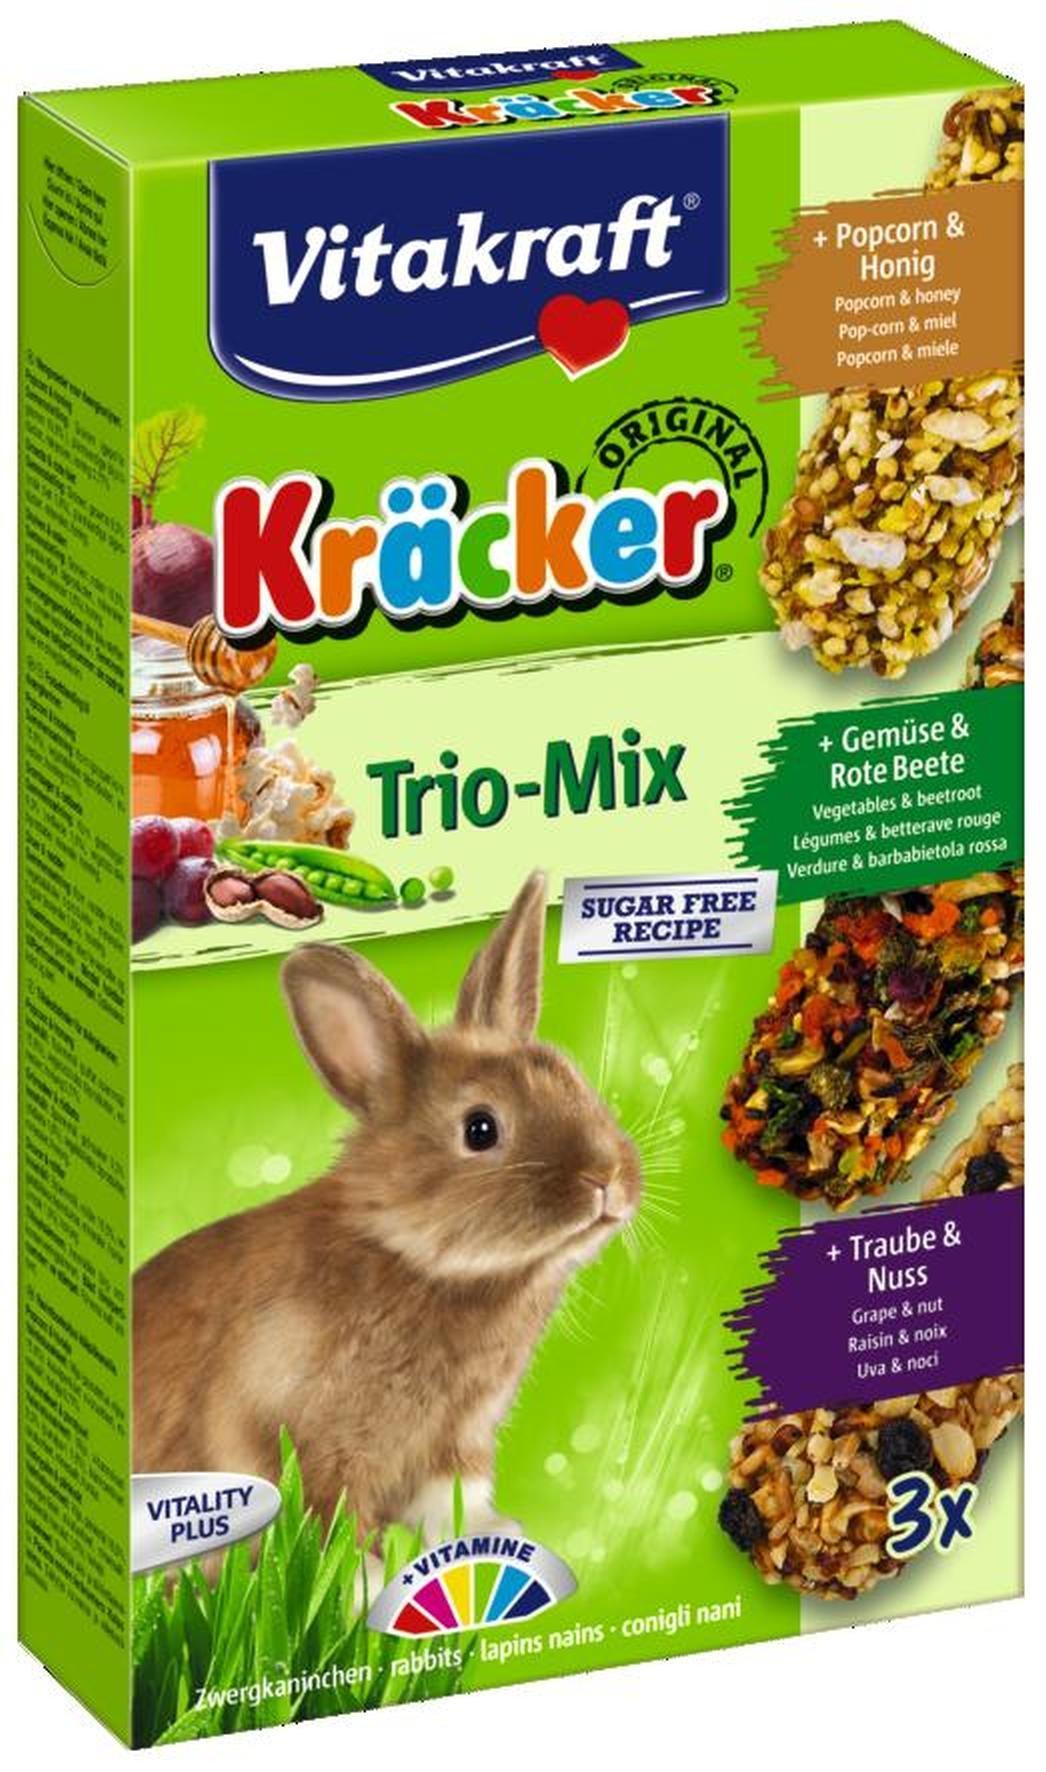 Vitakraft Trio Mix druif/noot-groente/biet-popcorn/honing-kracker dwergkonijn 3in1